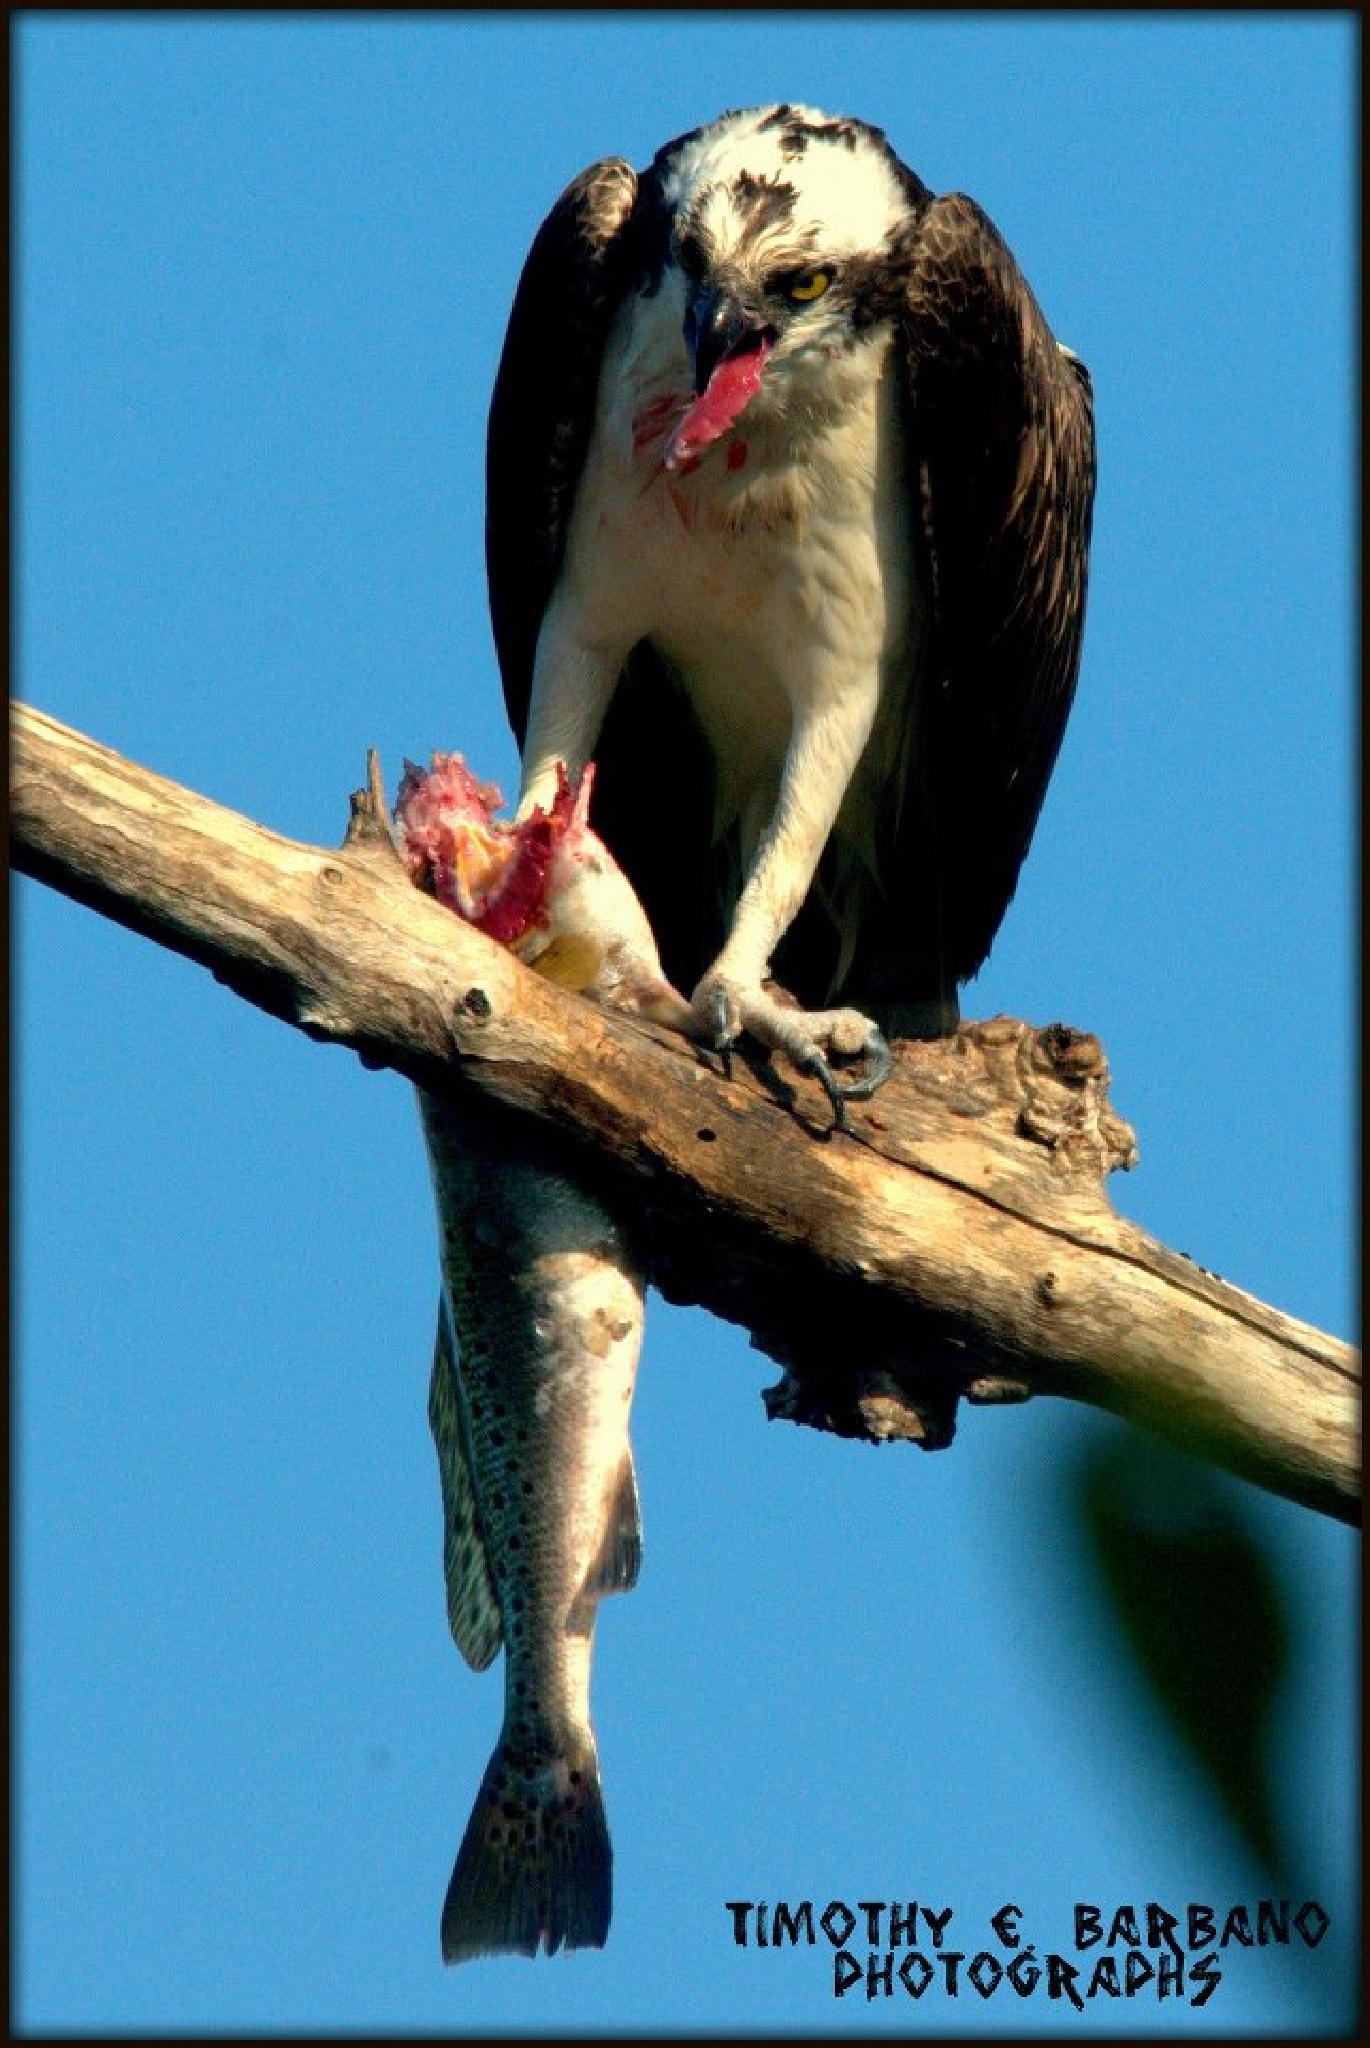 osprey (Pandion haliaetus) by  T. E. Barbano